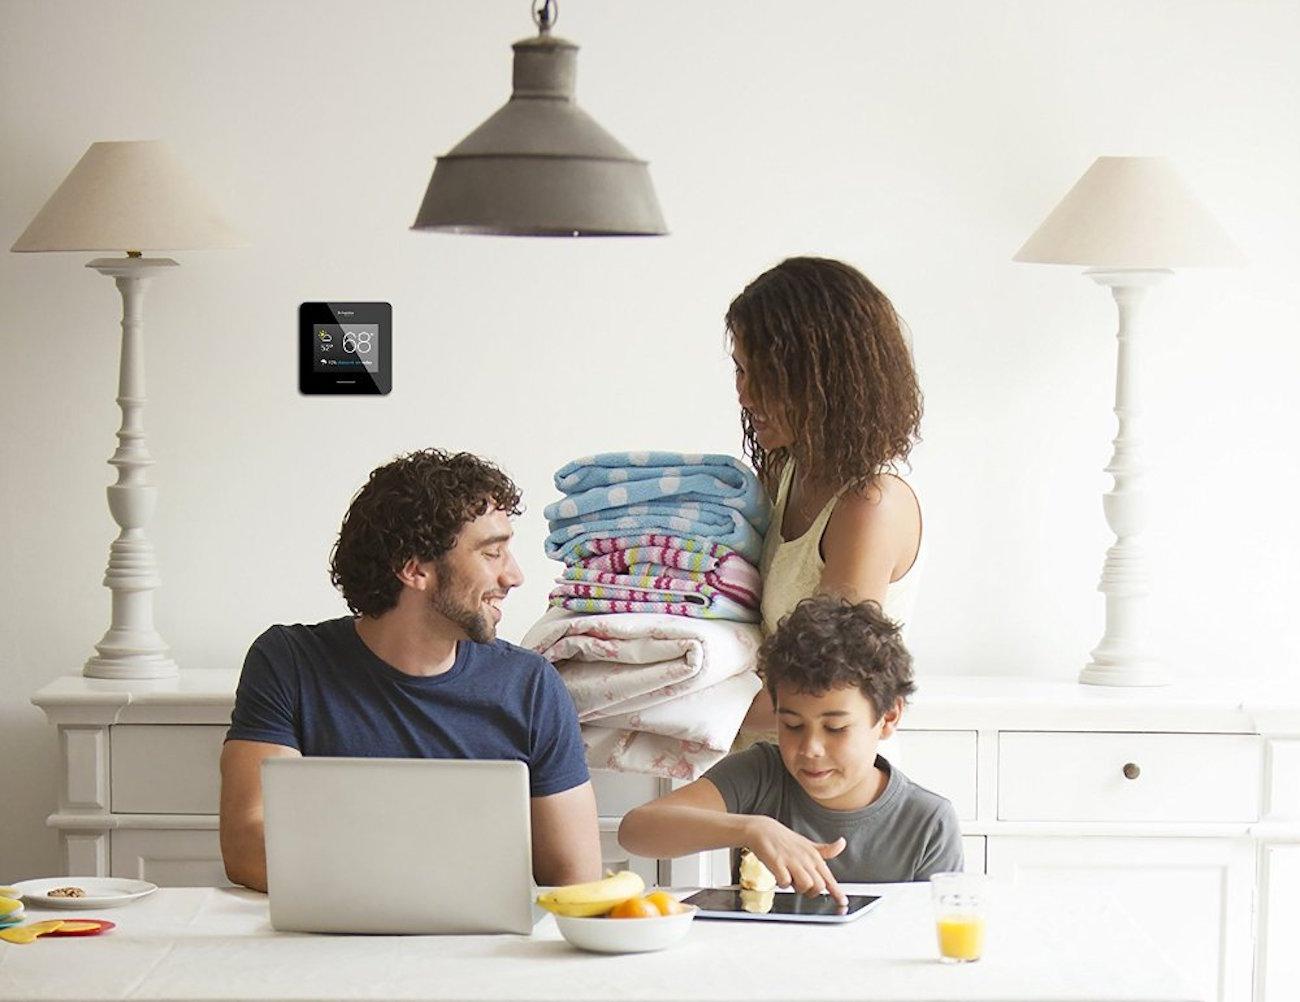 wiser-air-smart-thermostat-by-schneider-electric-02